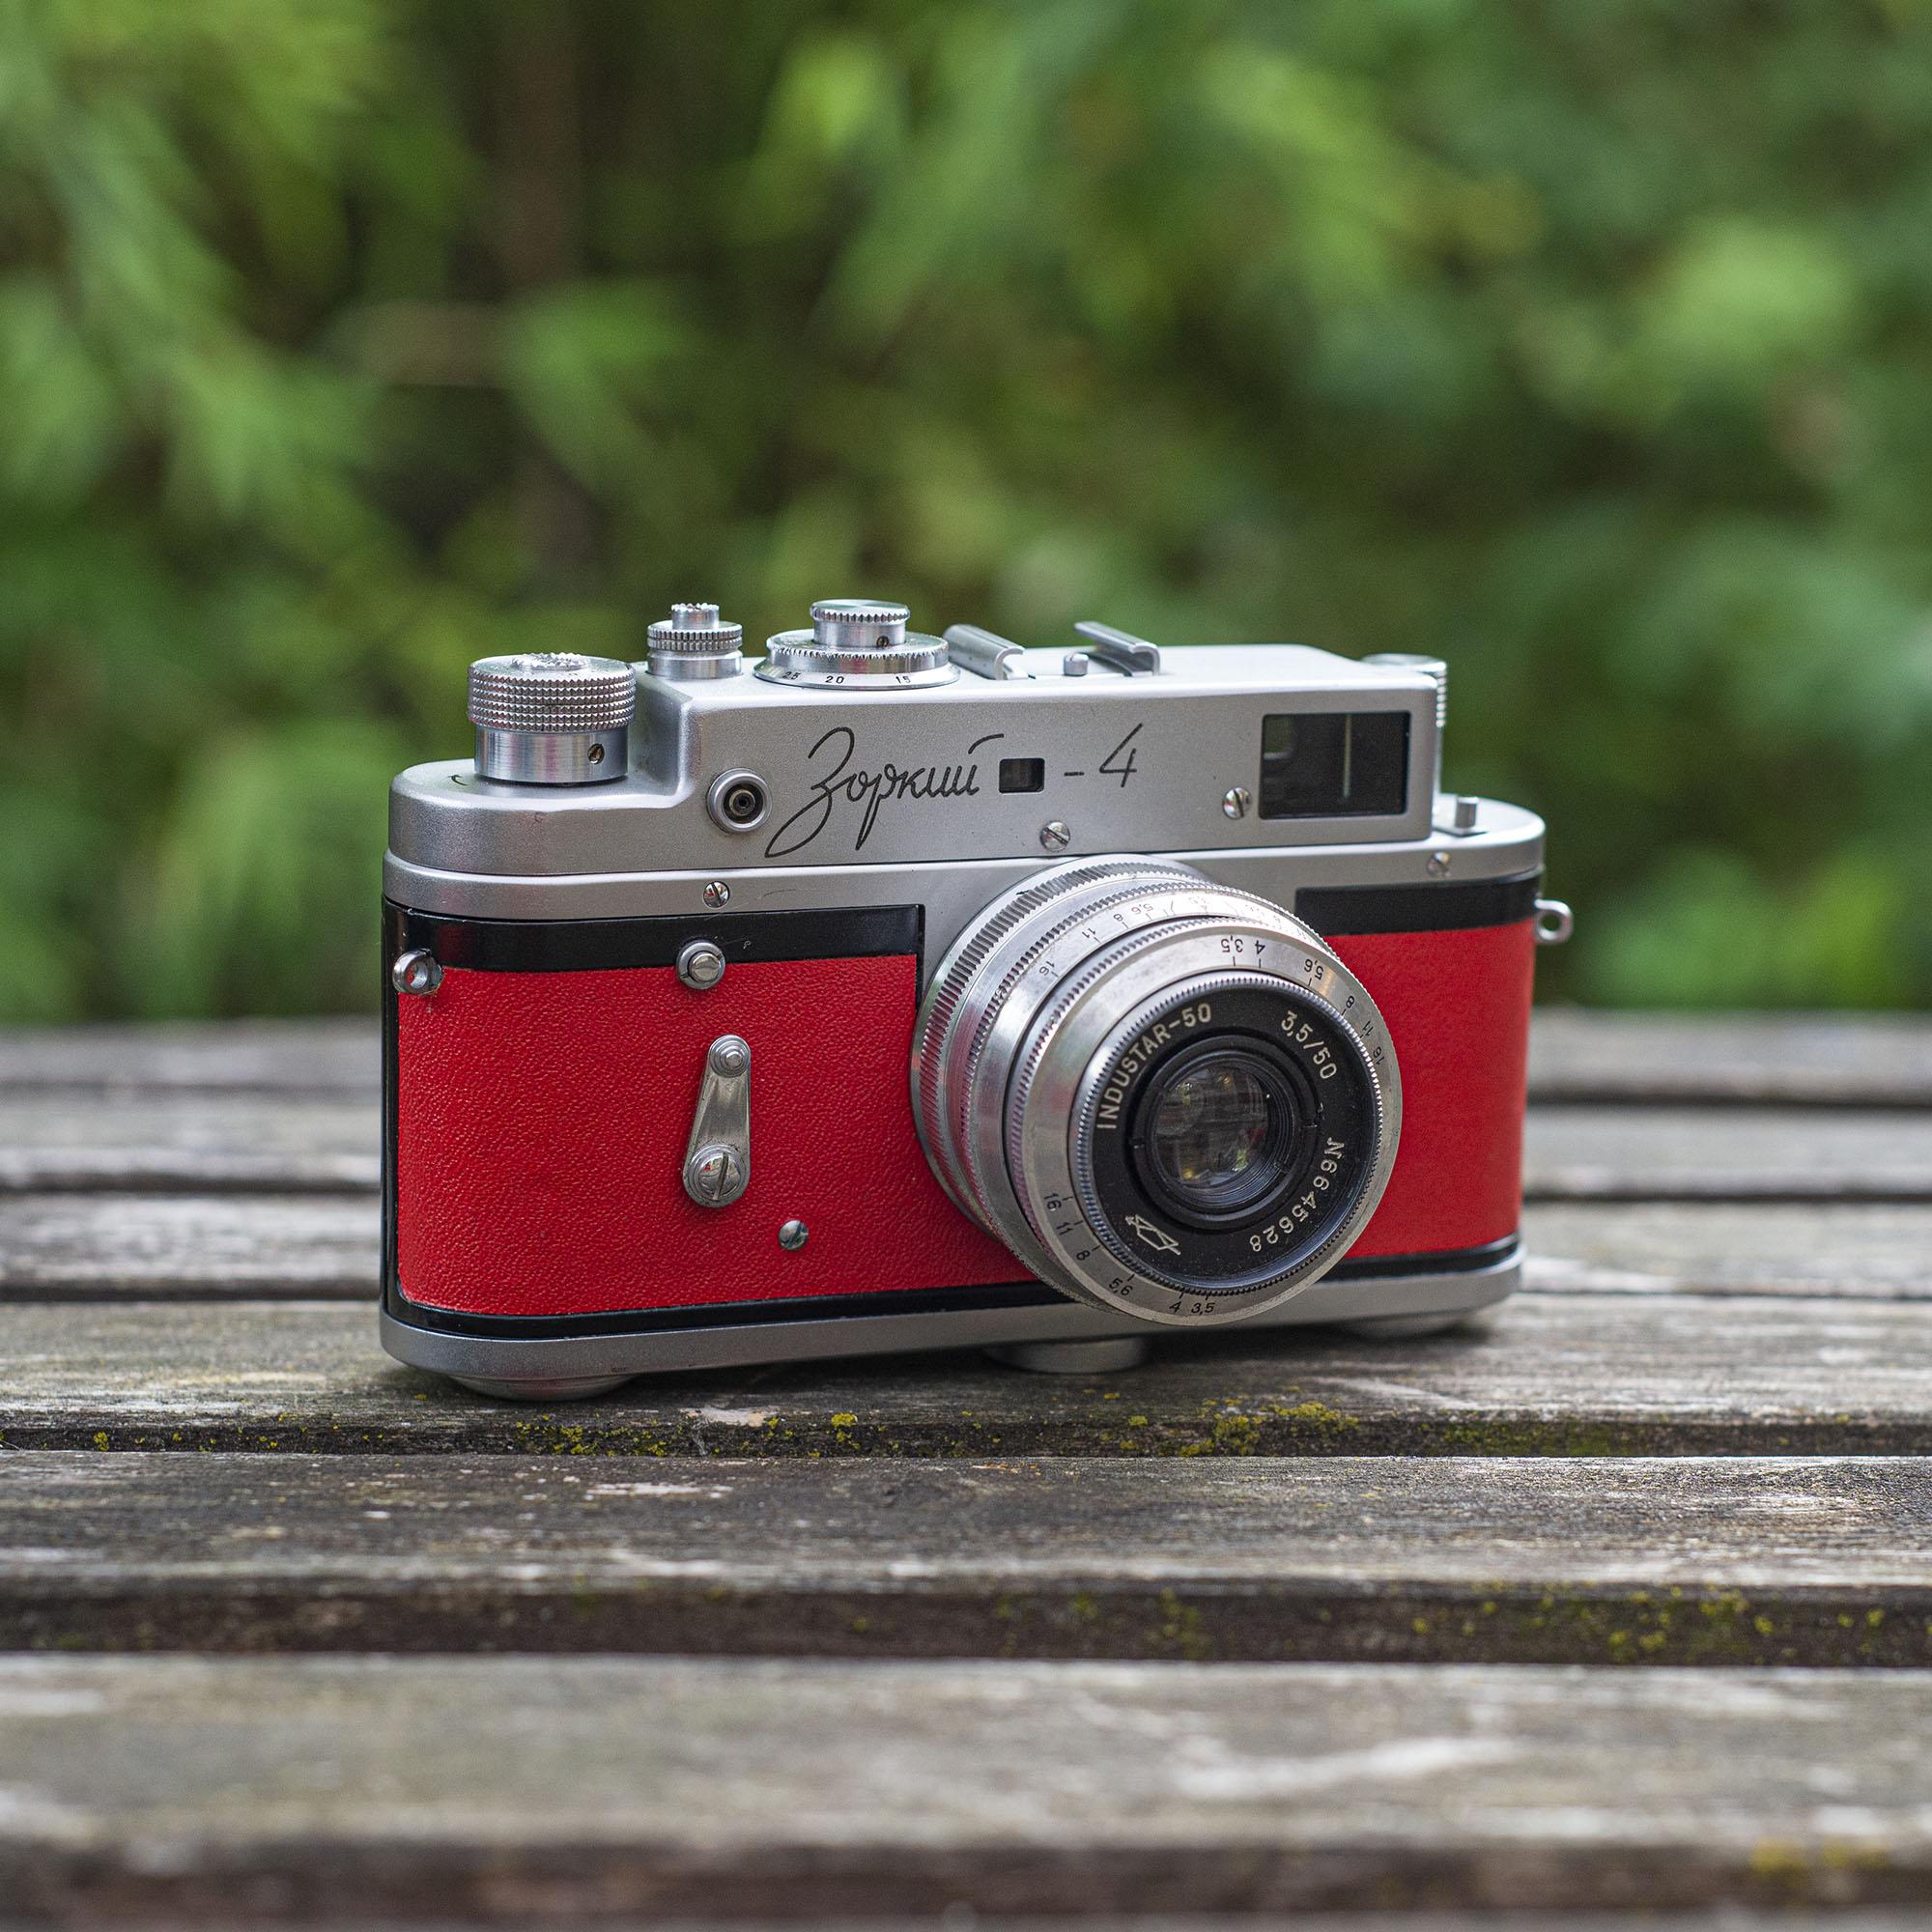 Zorki 4 camera with 50mm lens